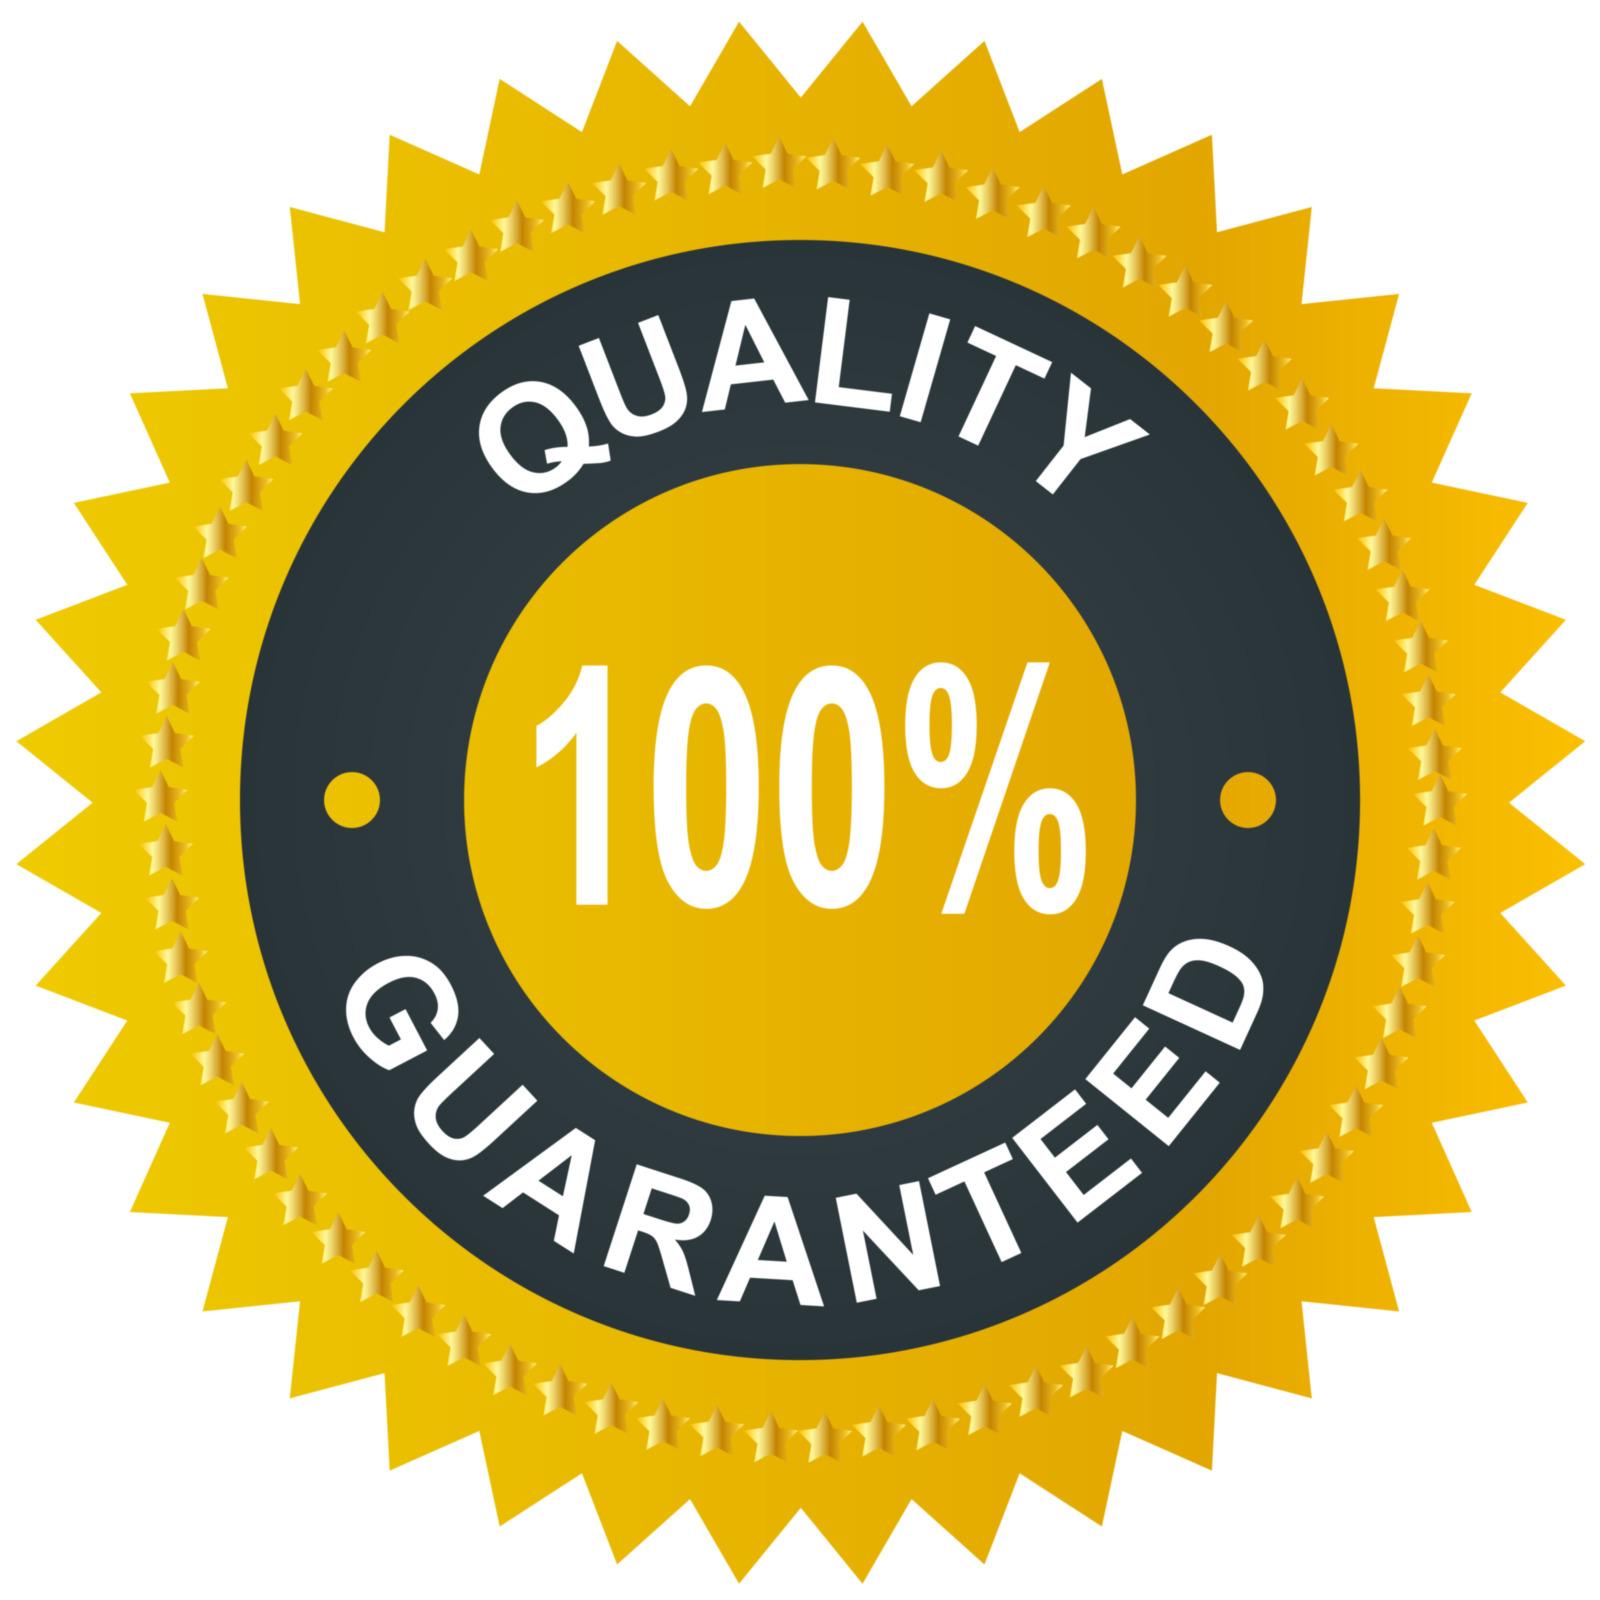 quality high technology business development